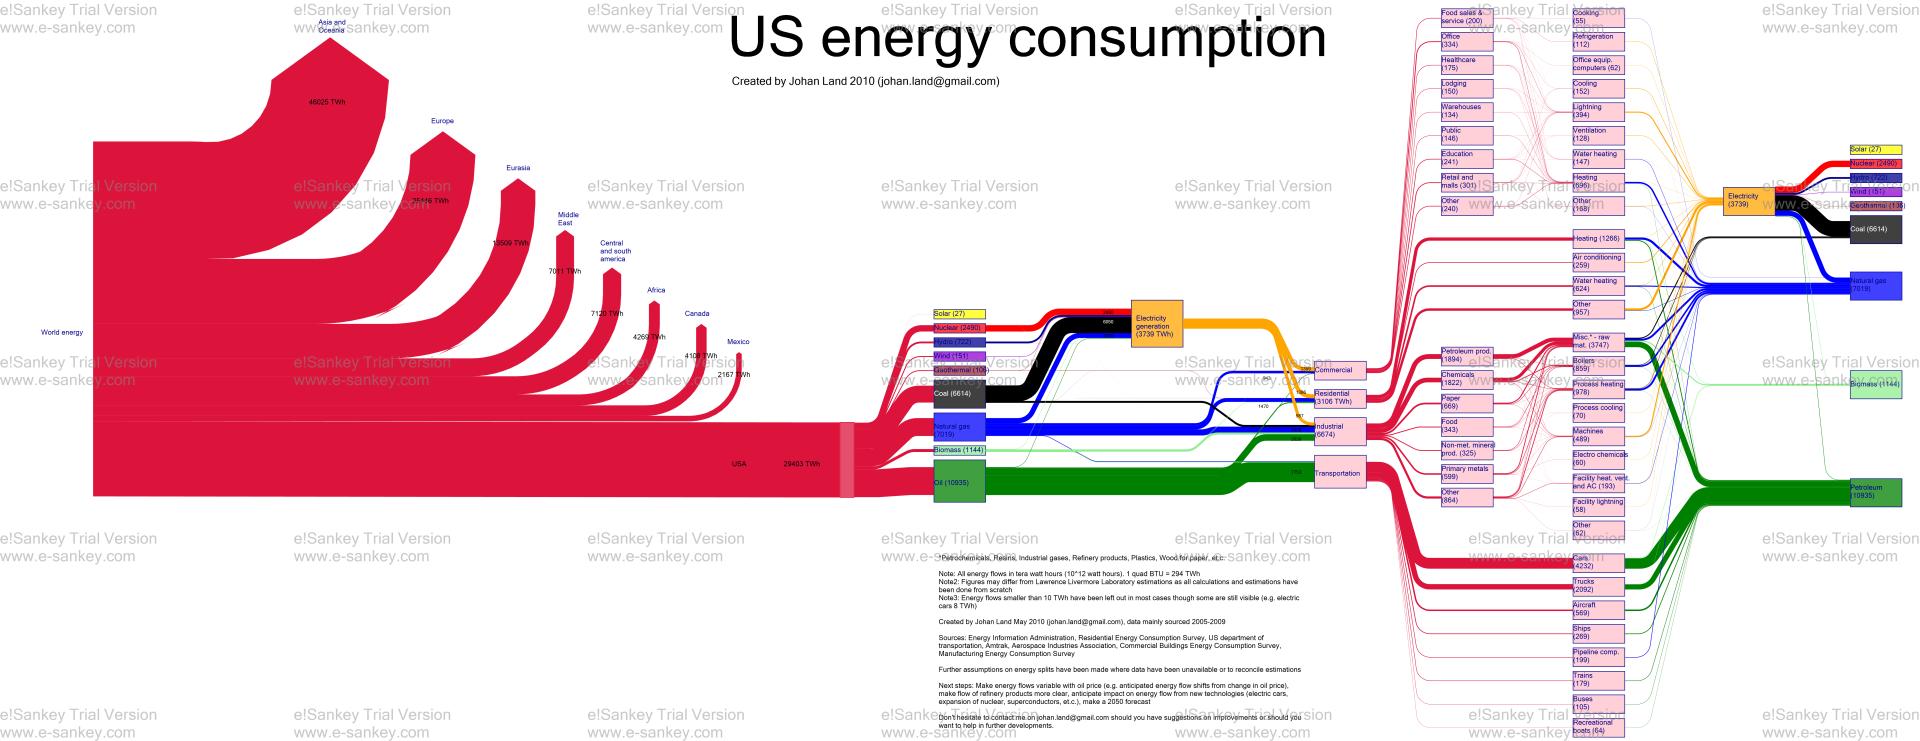 Sankey diagrams a sankey diagram says more than 1000 pie charts johan land us energy consumption sankey diagram resized ccuart Image collections